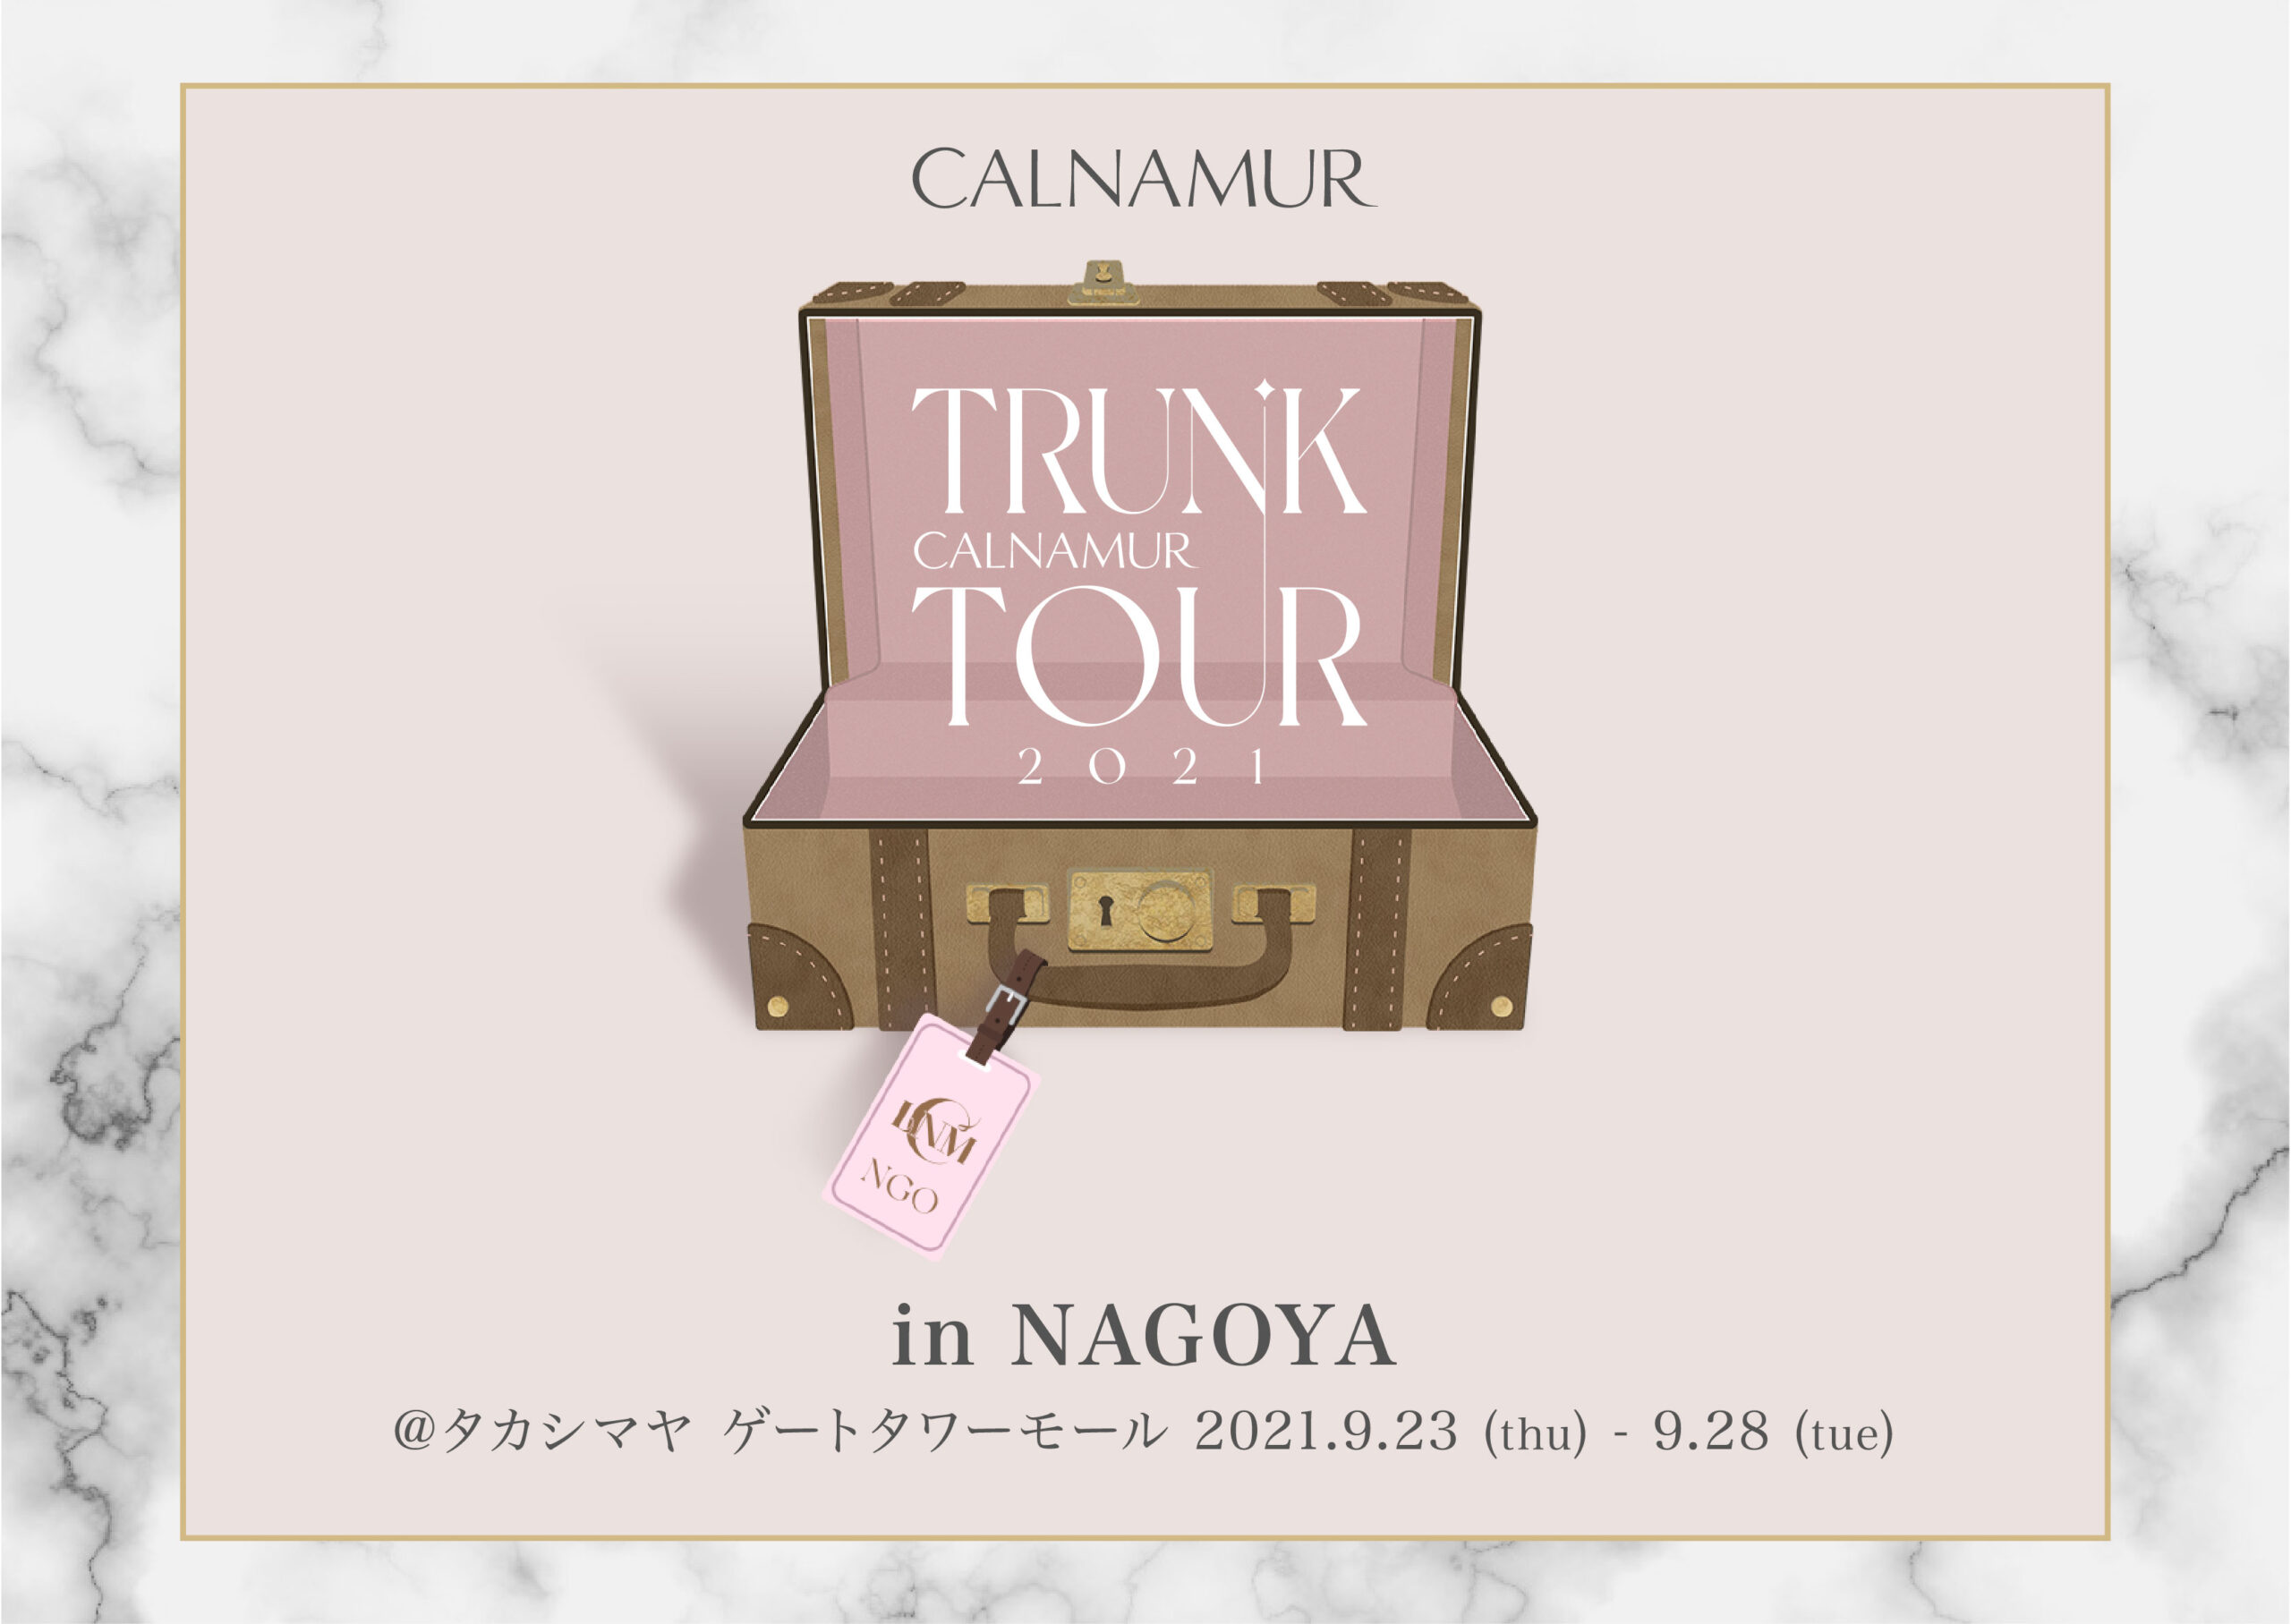 09.25(sat)CALNAMUR TRUNK TOUR 2021 in NAGOYA来店イベント入店予約について